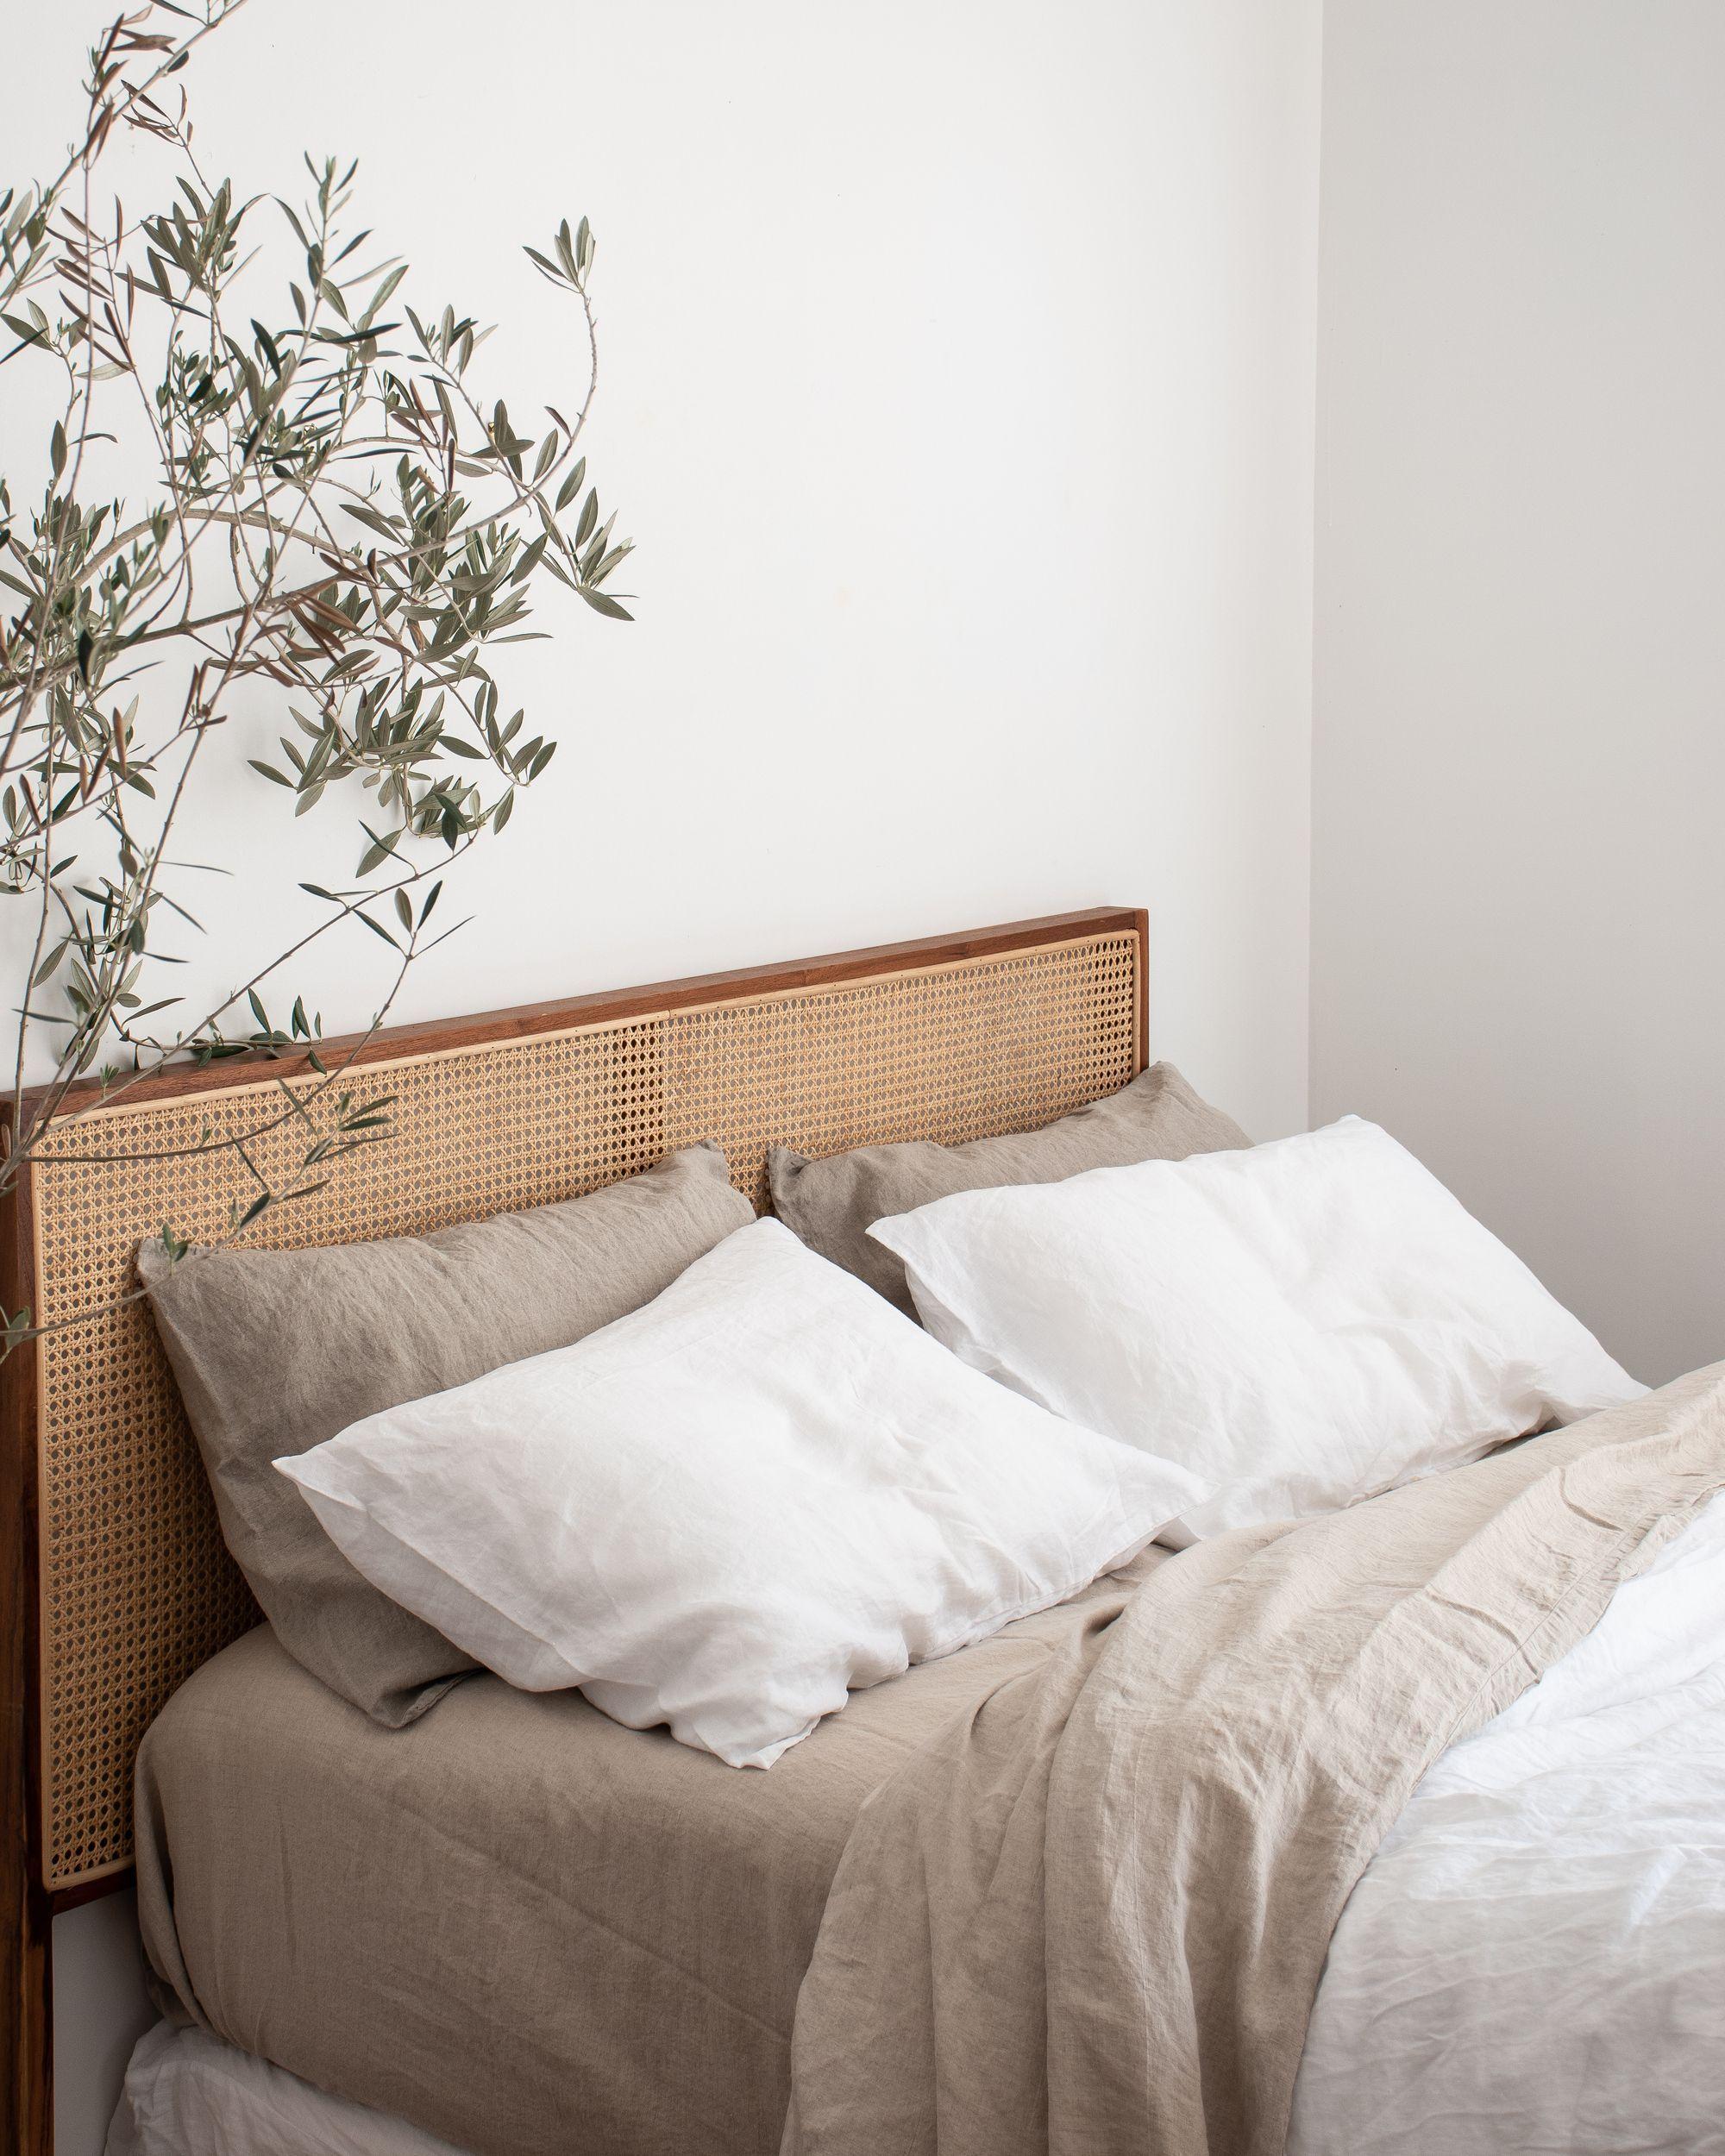 NEUTRAL & WHITE INTERIORS -   - #basichomedecor #cutehomedecorations #decoration... -  NEUTRAL & WHITE INTERIORS –   – #basichomedecor #cutehomedecorations #decorationappartement #de - #basichomedecor #cutehomedecorations #decoration #interiors #linenbedideas #minimalistbedroommen #neutral #white